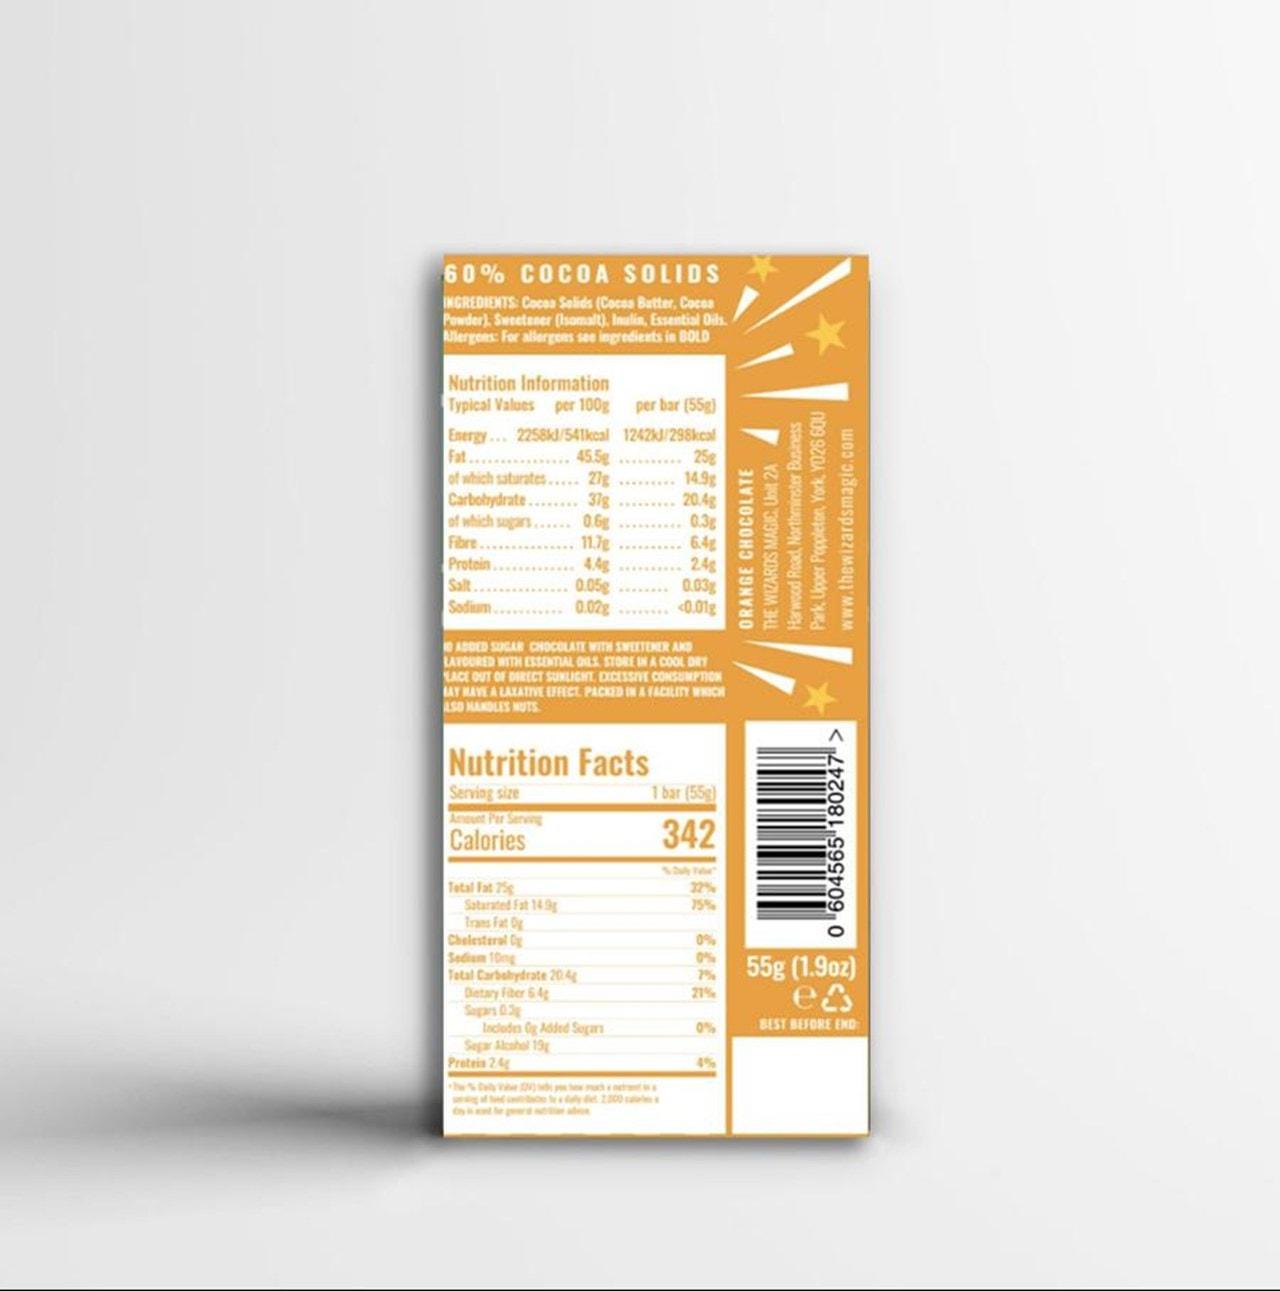 Wizards Magic Chocolate: 1% Sugar Original Gift Pack: Mint & Orange (Pack of 4) - 6